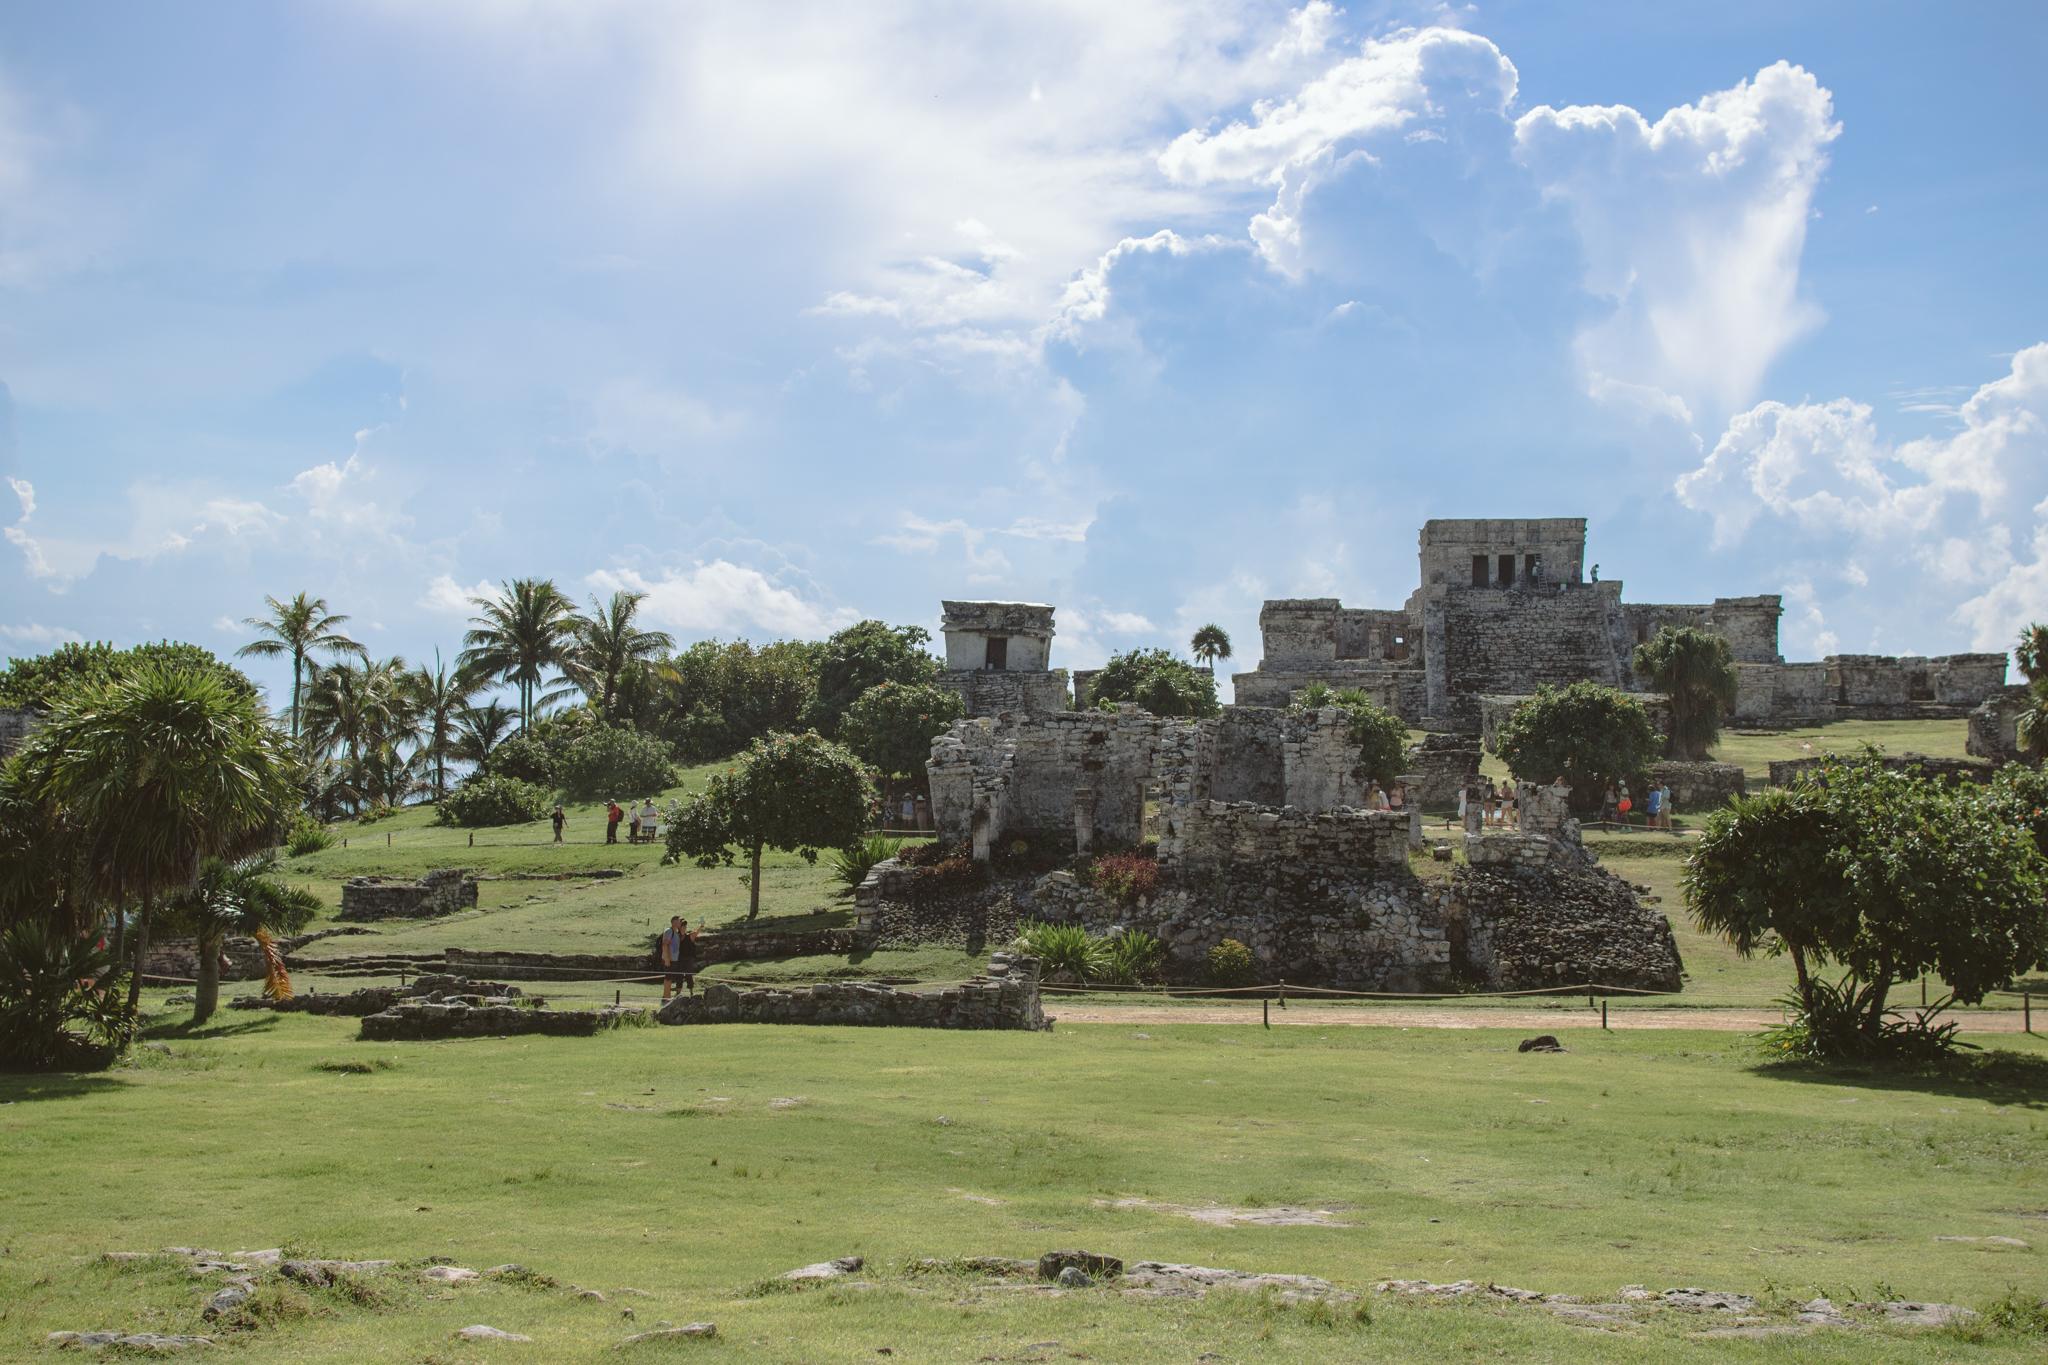 tulum-ruined-city-mexico-photograph